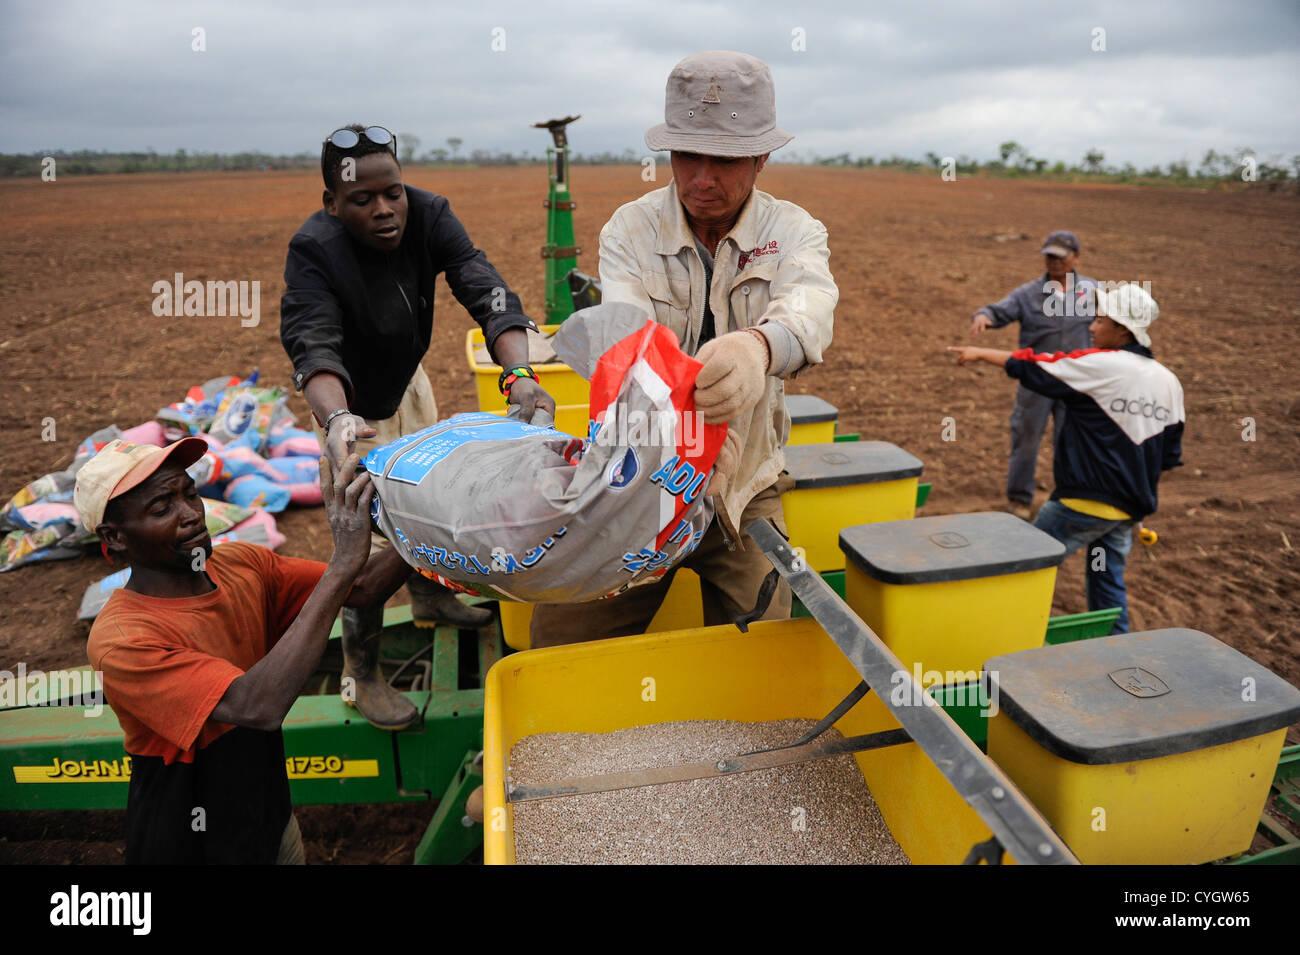 Africa ANGOLA, Malanje, ANGOLA Malange , PAC Pòlo Agroindustrial de Capanda, Black Stone Farm, a 20.000 hectare - Stock Image